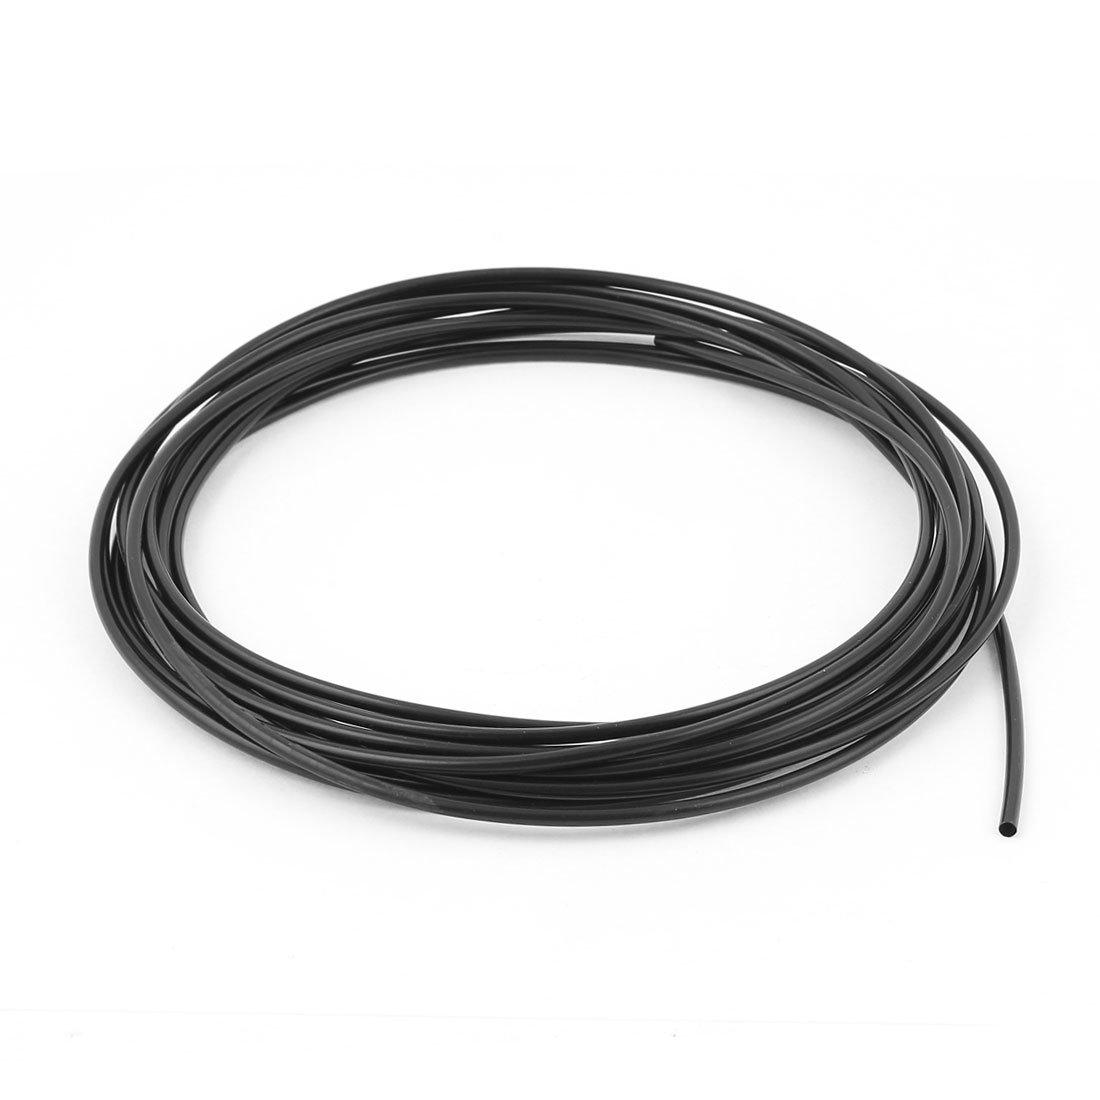 5 metros 2mm Dia Poliolefina Ratio 2:1 Tubo Termorretrá ctil tubo Cable Envolvente Sourcingmap a15060100ux0636